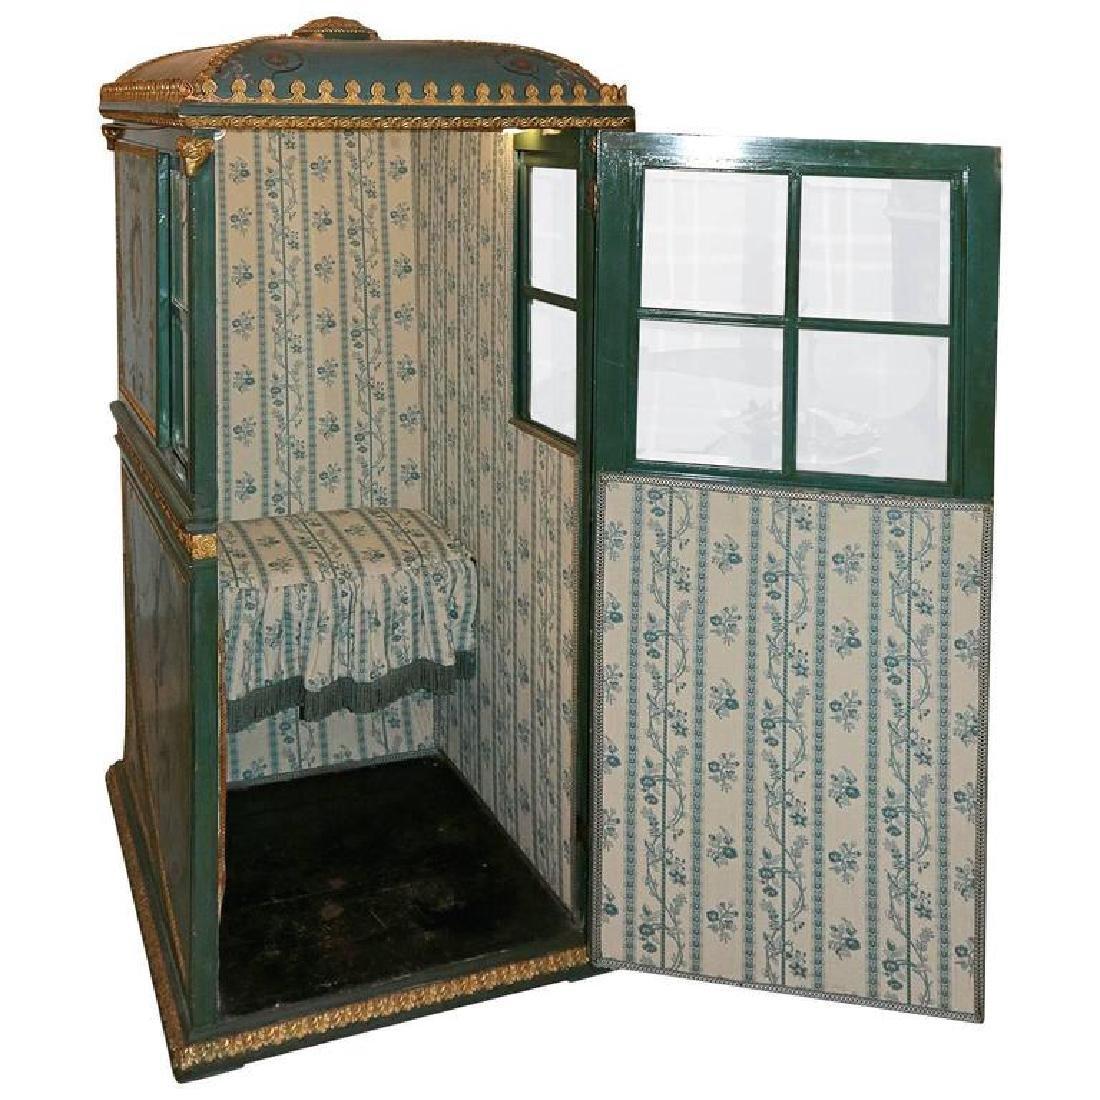 19th Century Venetian Giltwood Hand-Painted Sedan Chair - 5